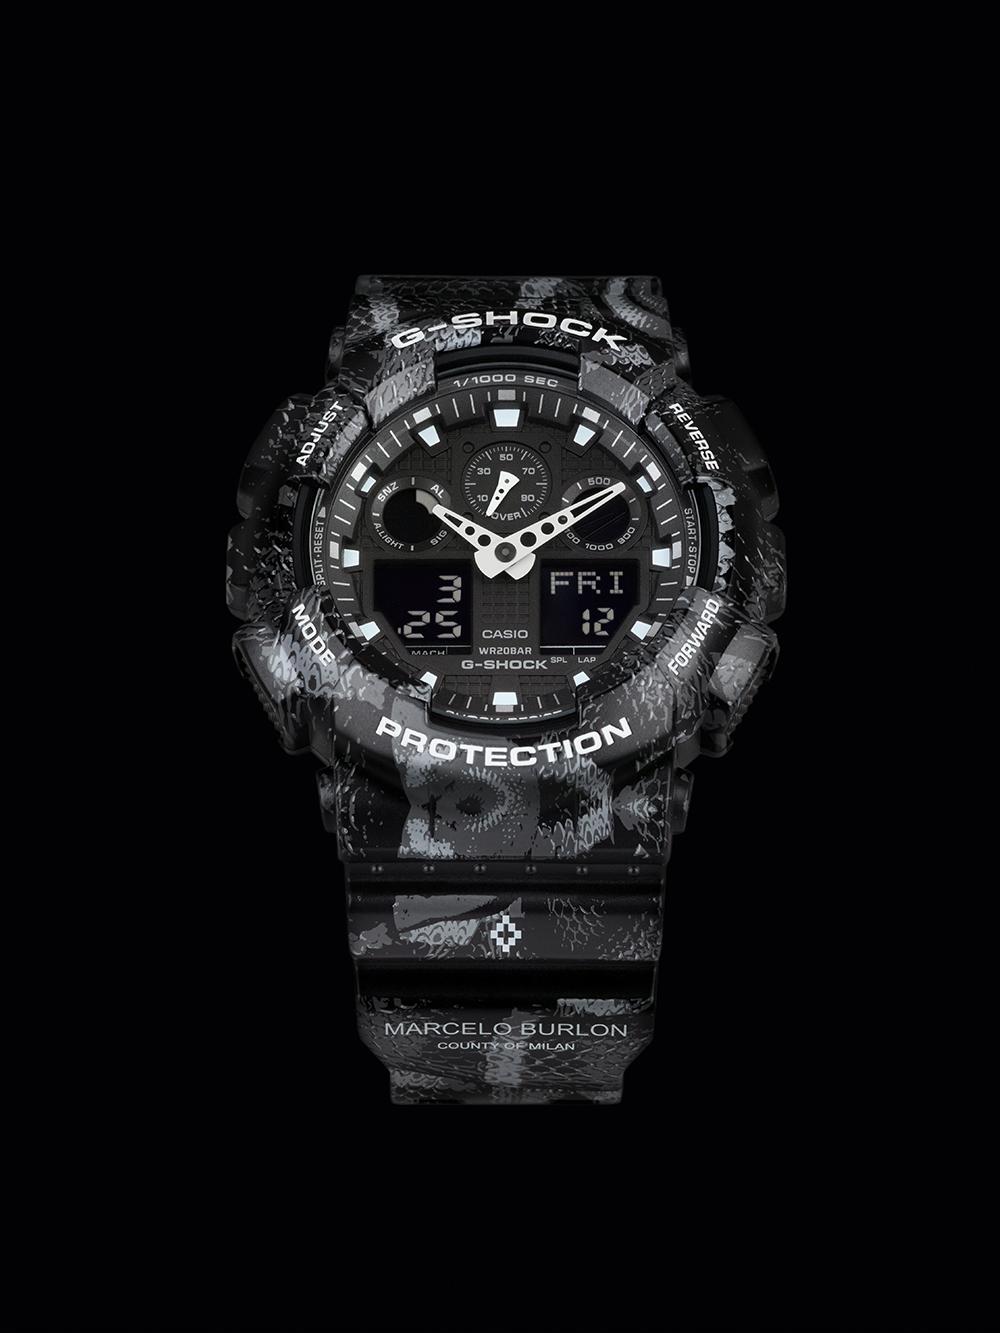 G-Shock, Marcelo Burlon, watch